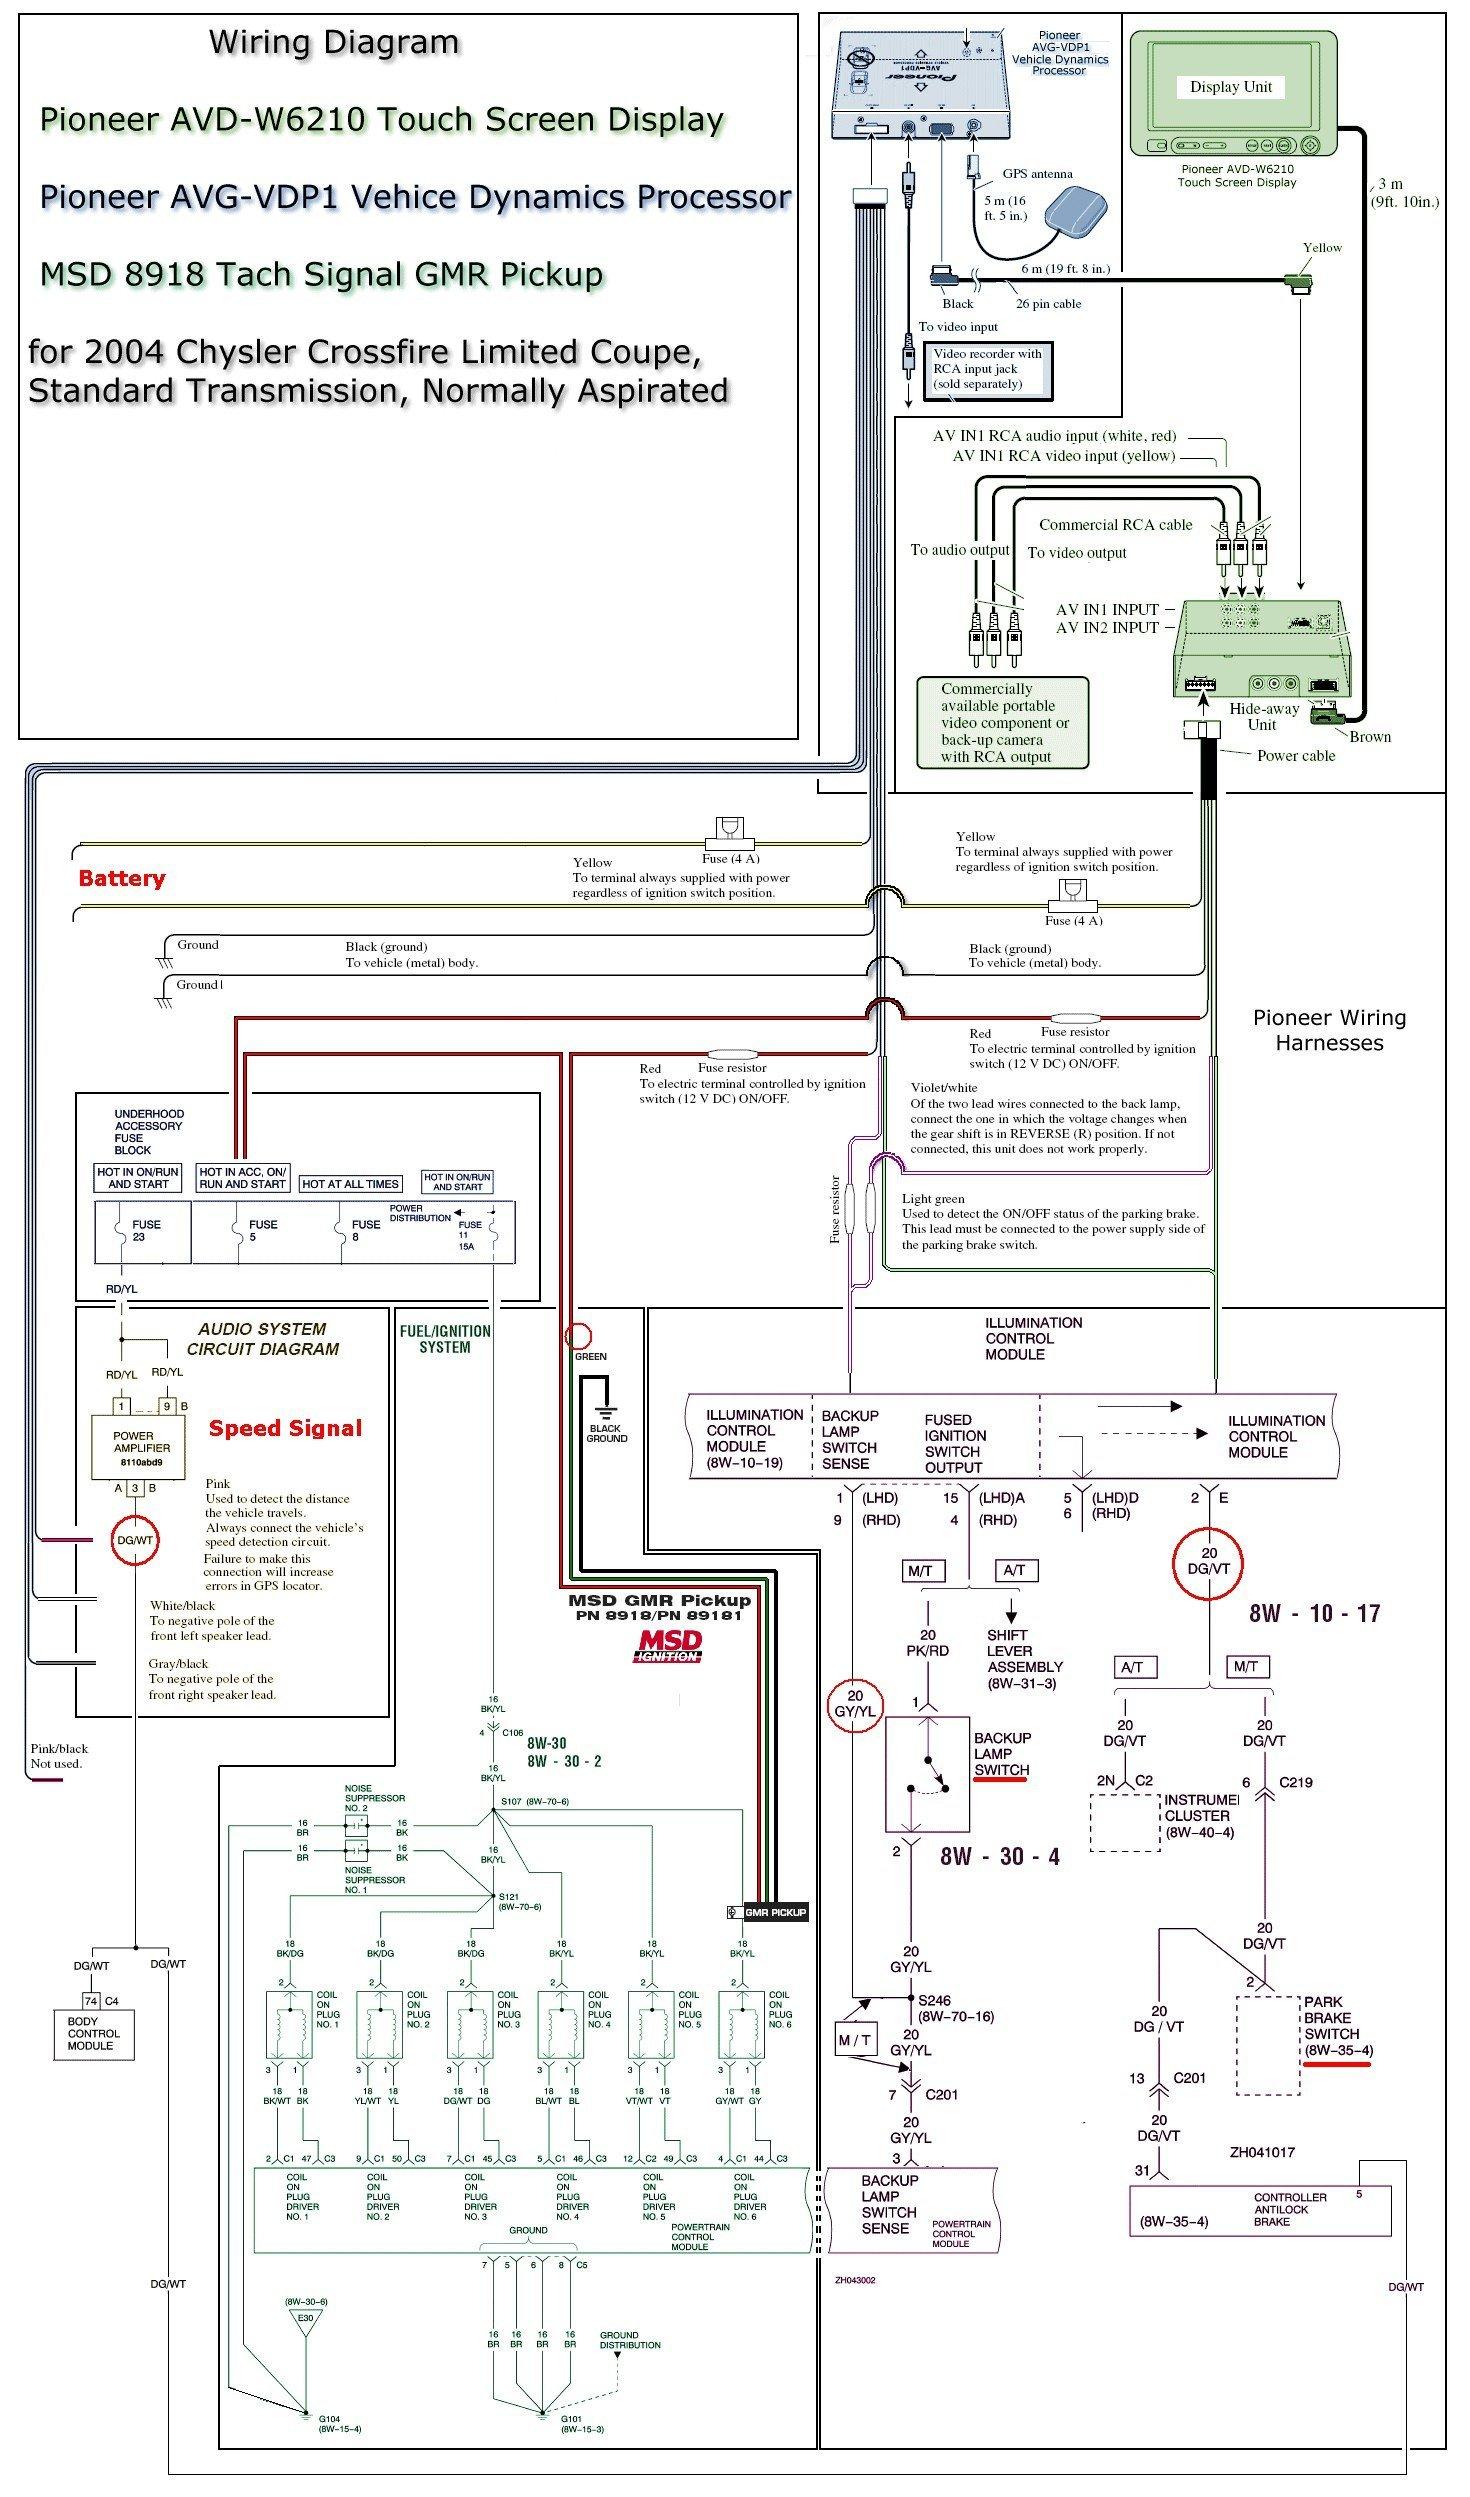 Pioneer Avh X2800Bs Wiring Diagram For Ranger | Wiring Library - Pioneer Avh-X2800Bs Wiring Harness Diagram